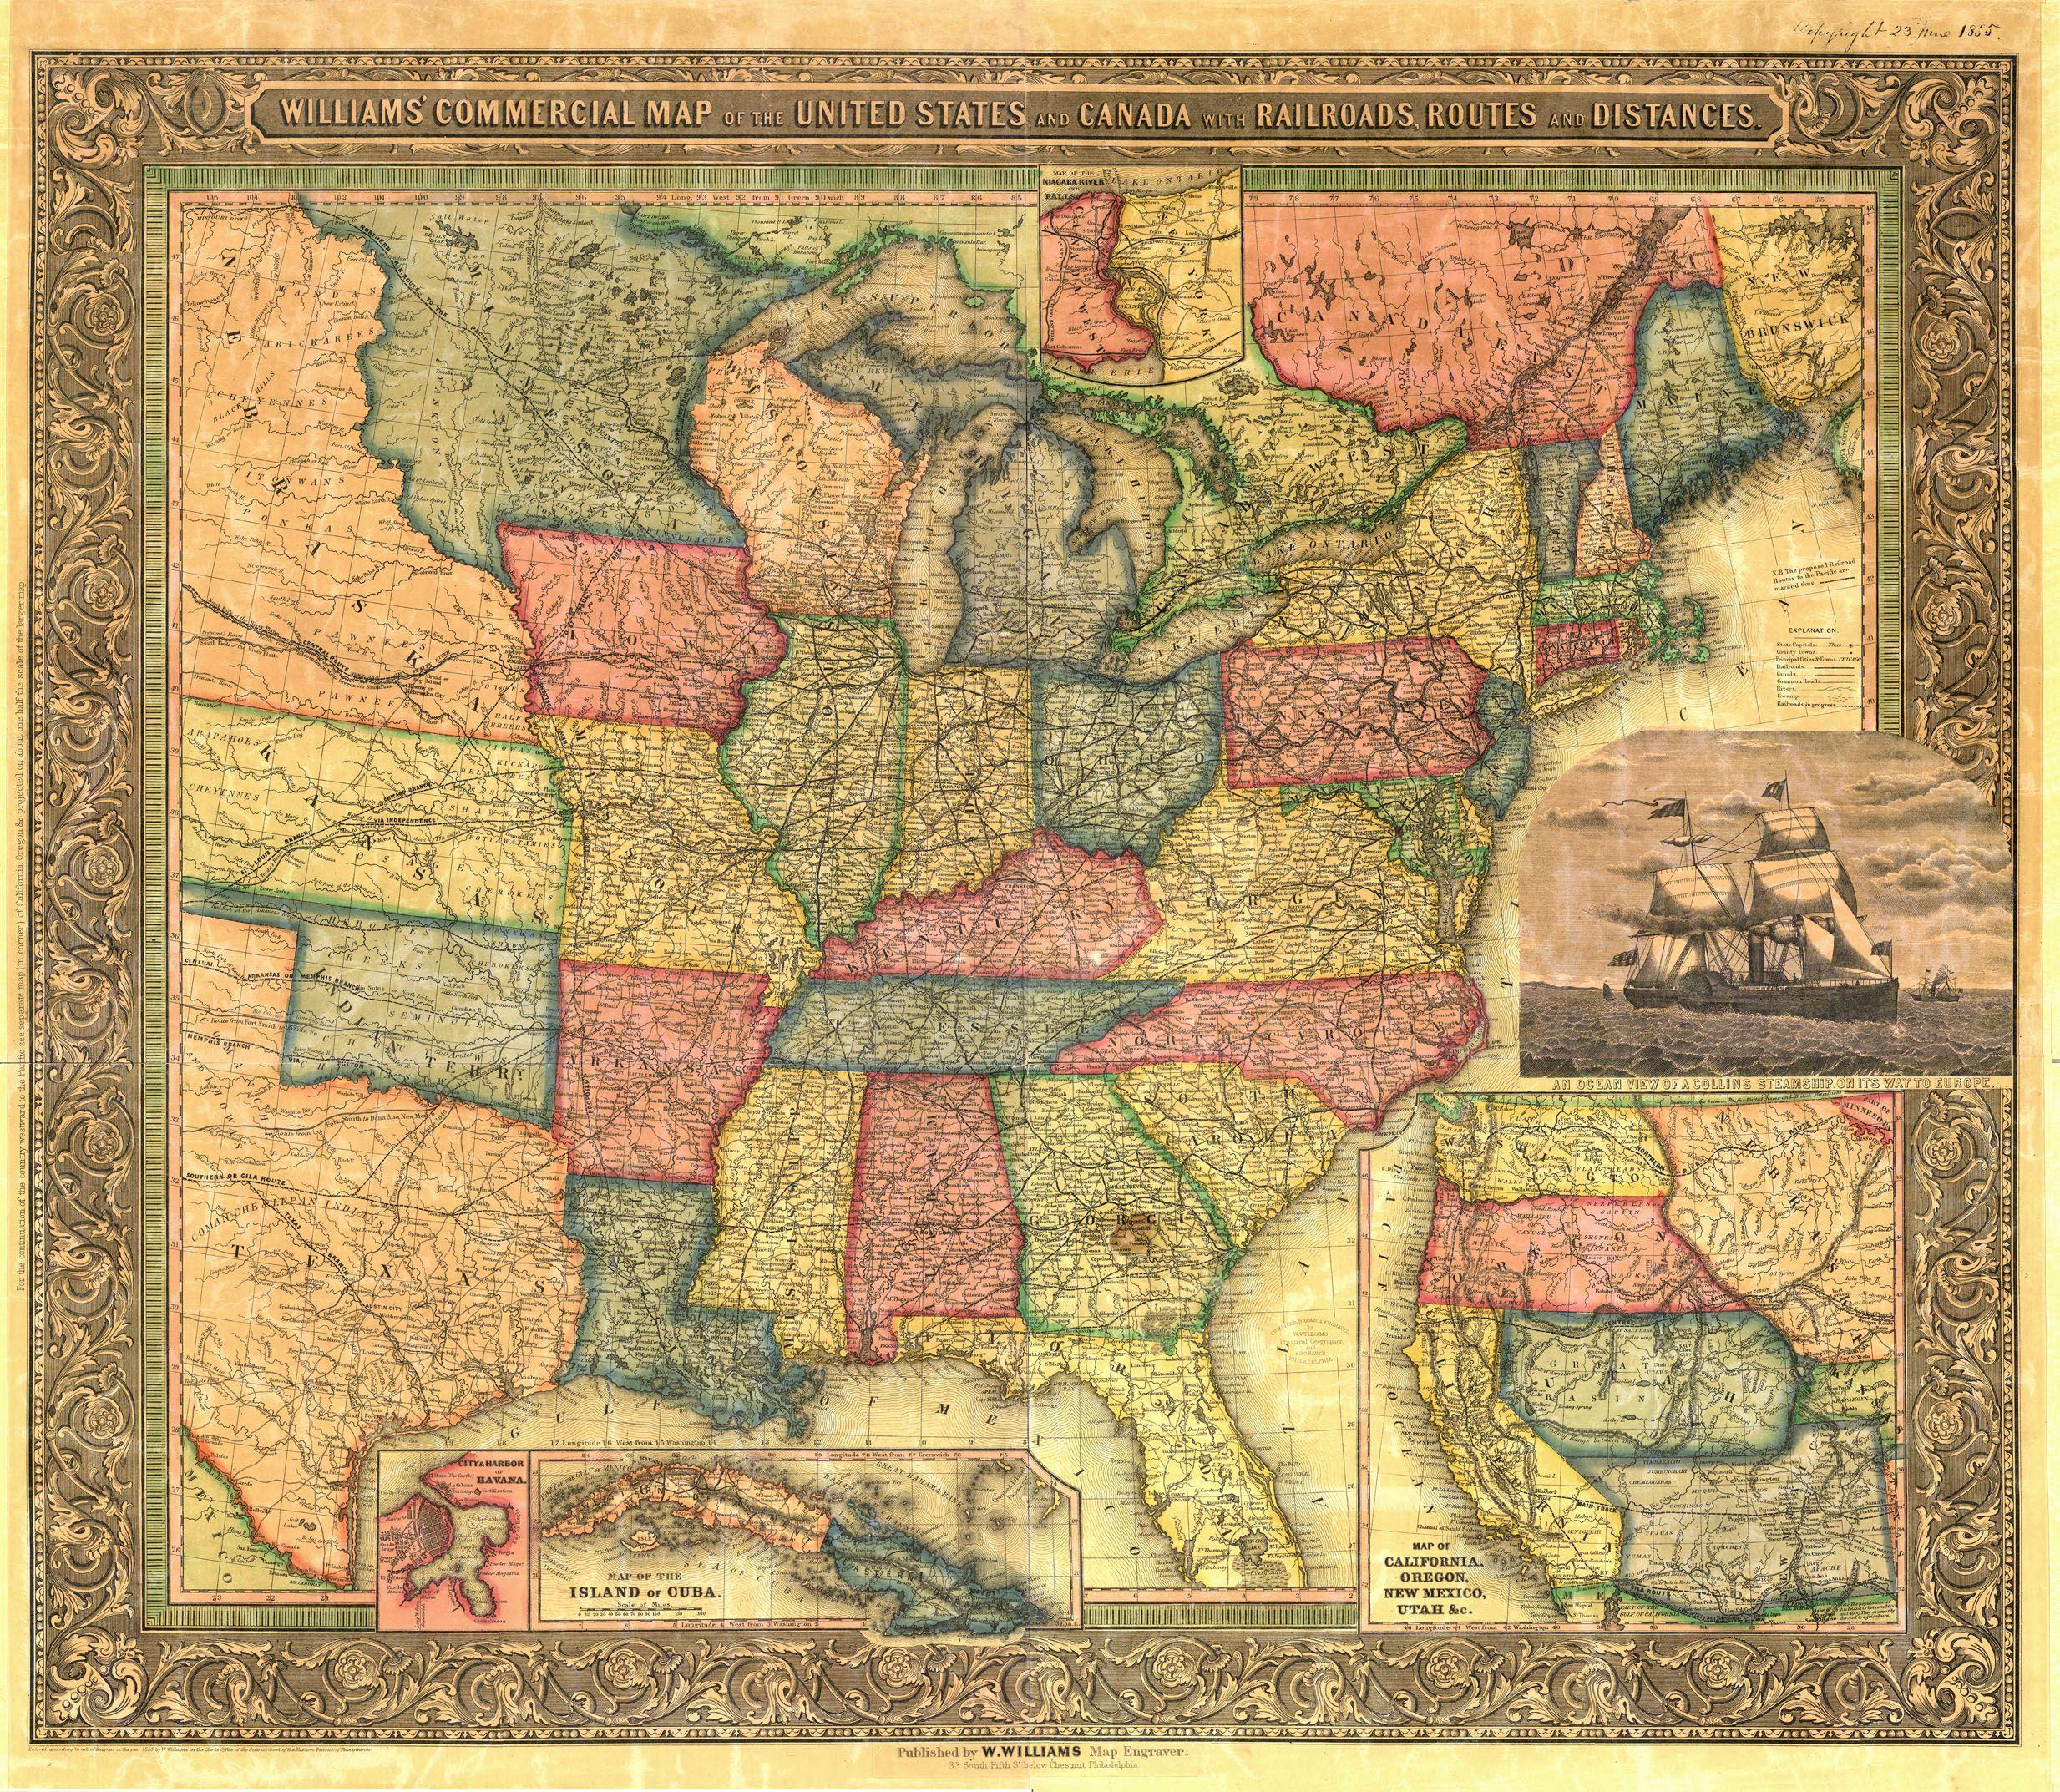 HttpwwwoldmapscomRRWilliamsmaponlywebjpg - 1889 us railroad map